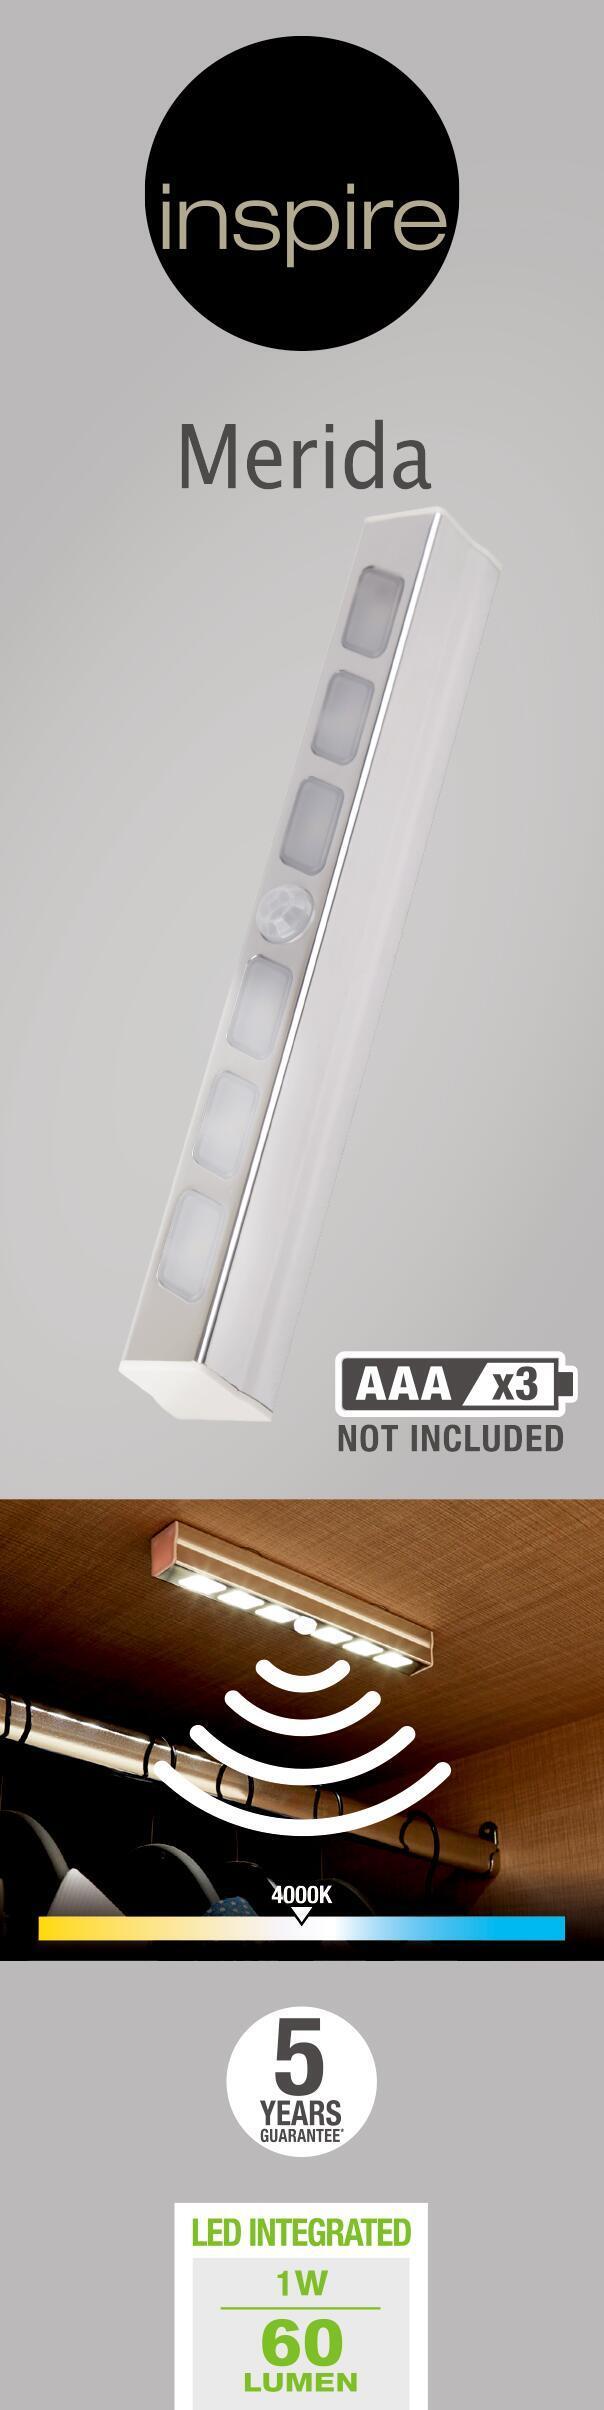 Illuminazione mobili LED integrato Merida 50 LM IP20 Inspire - 11